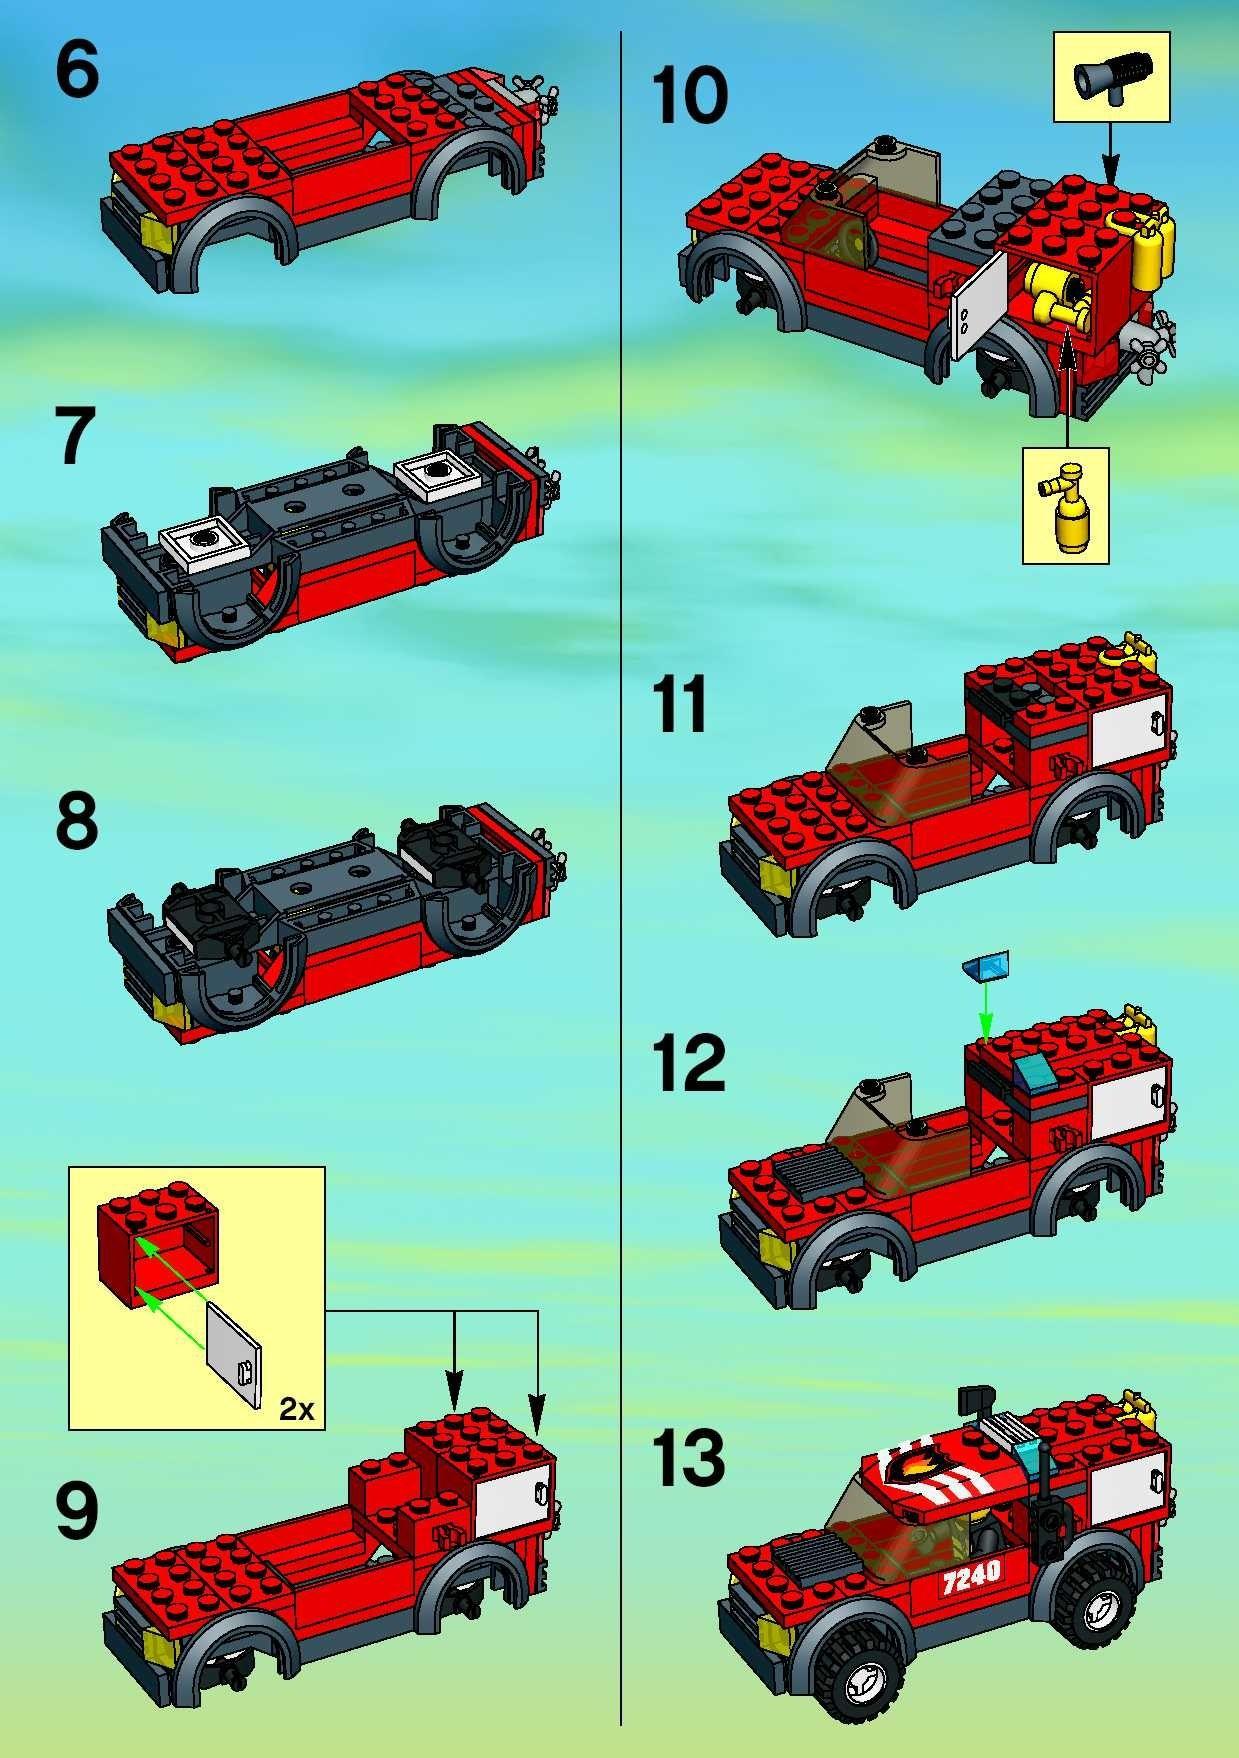 City Police Rescue - Fire Headquarters [Lego 7240]